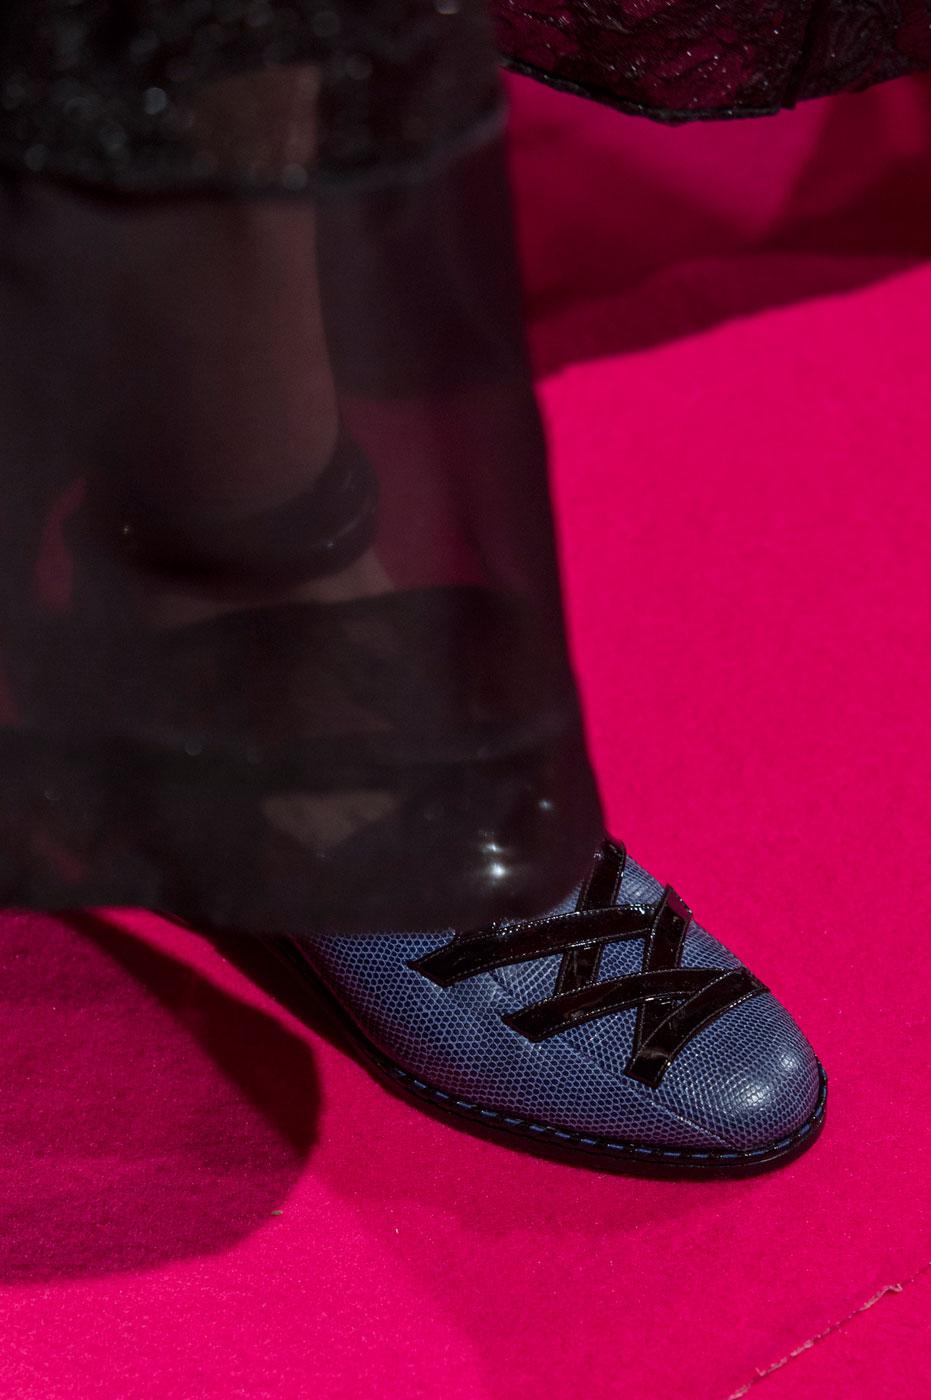 Schiaparelli-fashion-runway-show-close-ups-haute-couture-paris-spring-summer-2015-the-impression-64